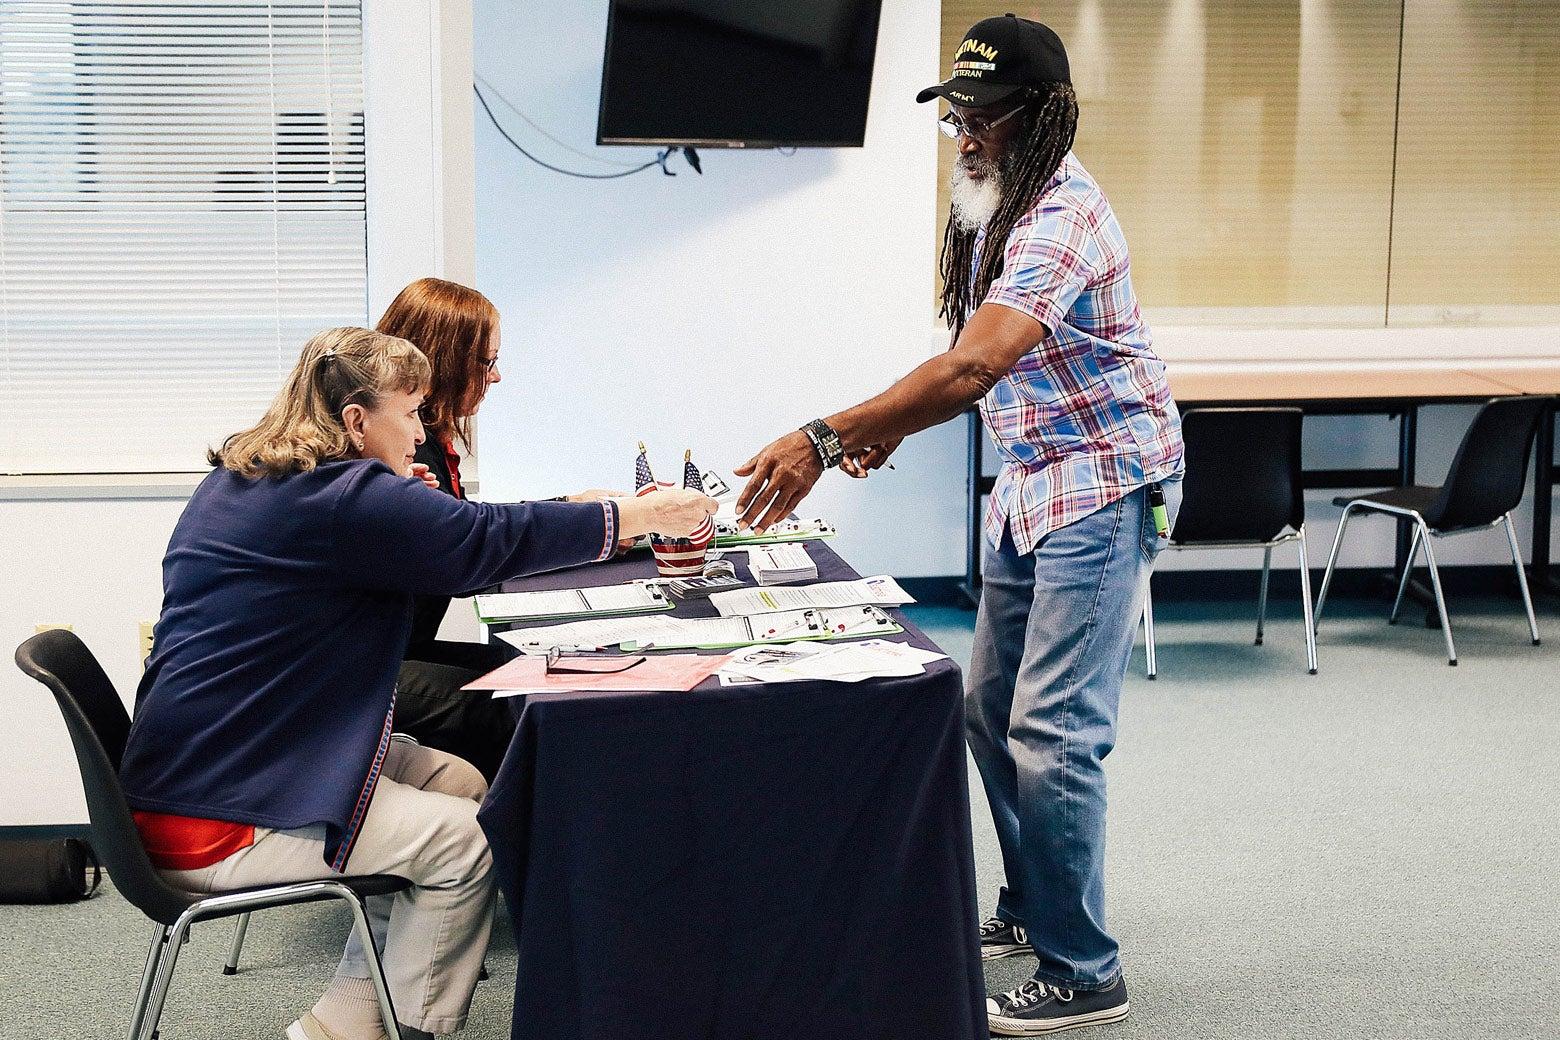 Voter registration workers Rosey Brockamp and Sheryl Podley register Clarence Singleton on Jan. 8 in Fort Myers, Florida.